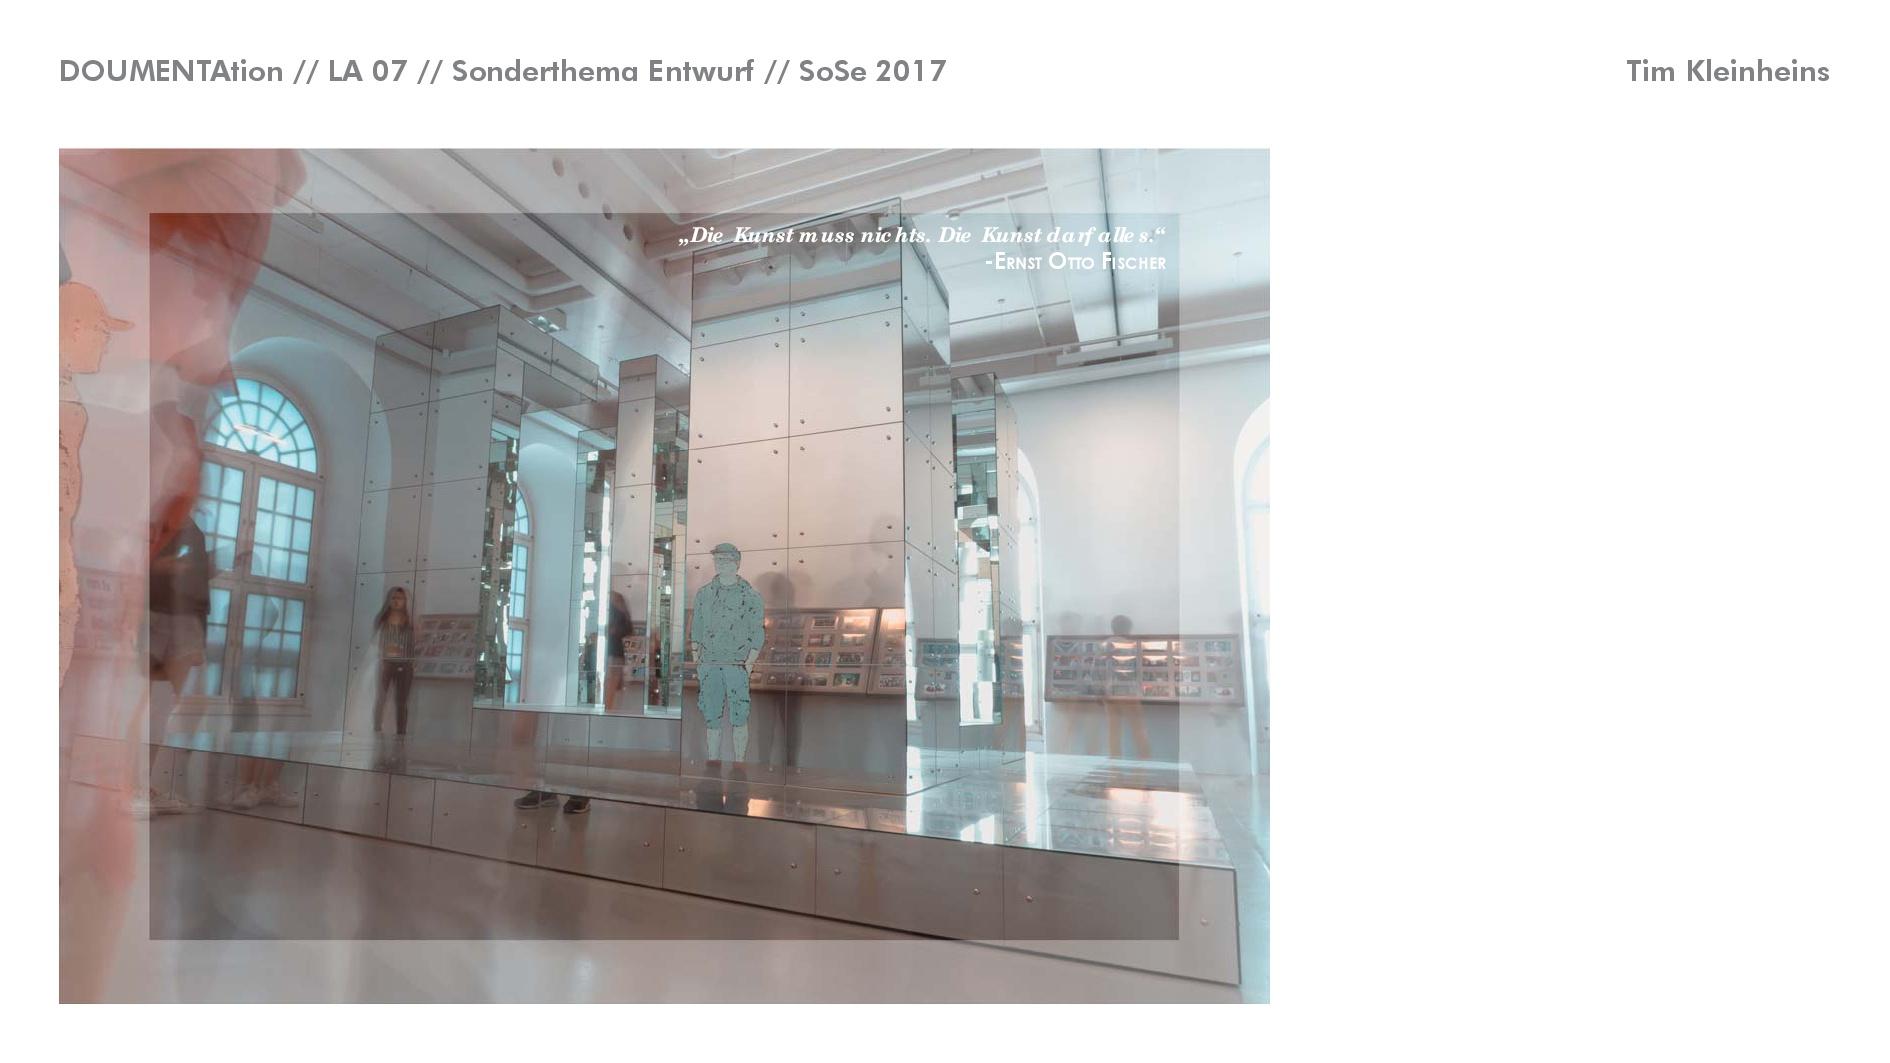 NEU Sonderthema Entwerfen SoSe 17 010